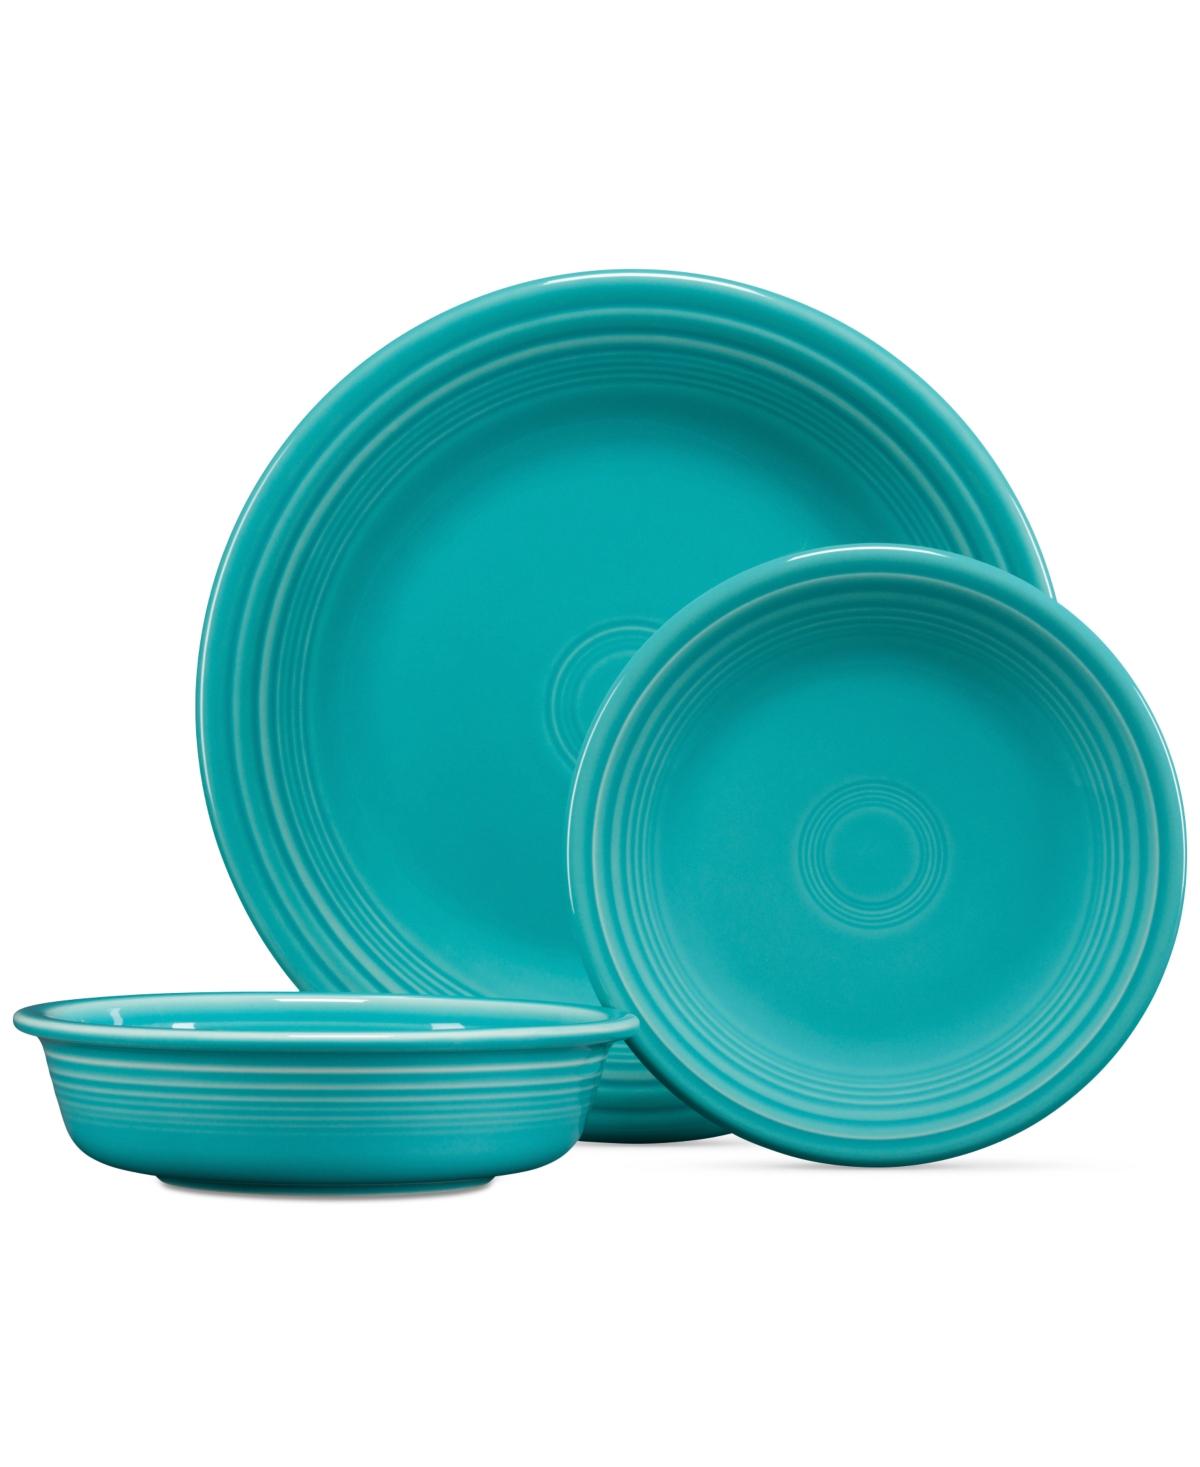 turquoise 3 pc dinner set